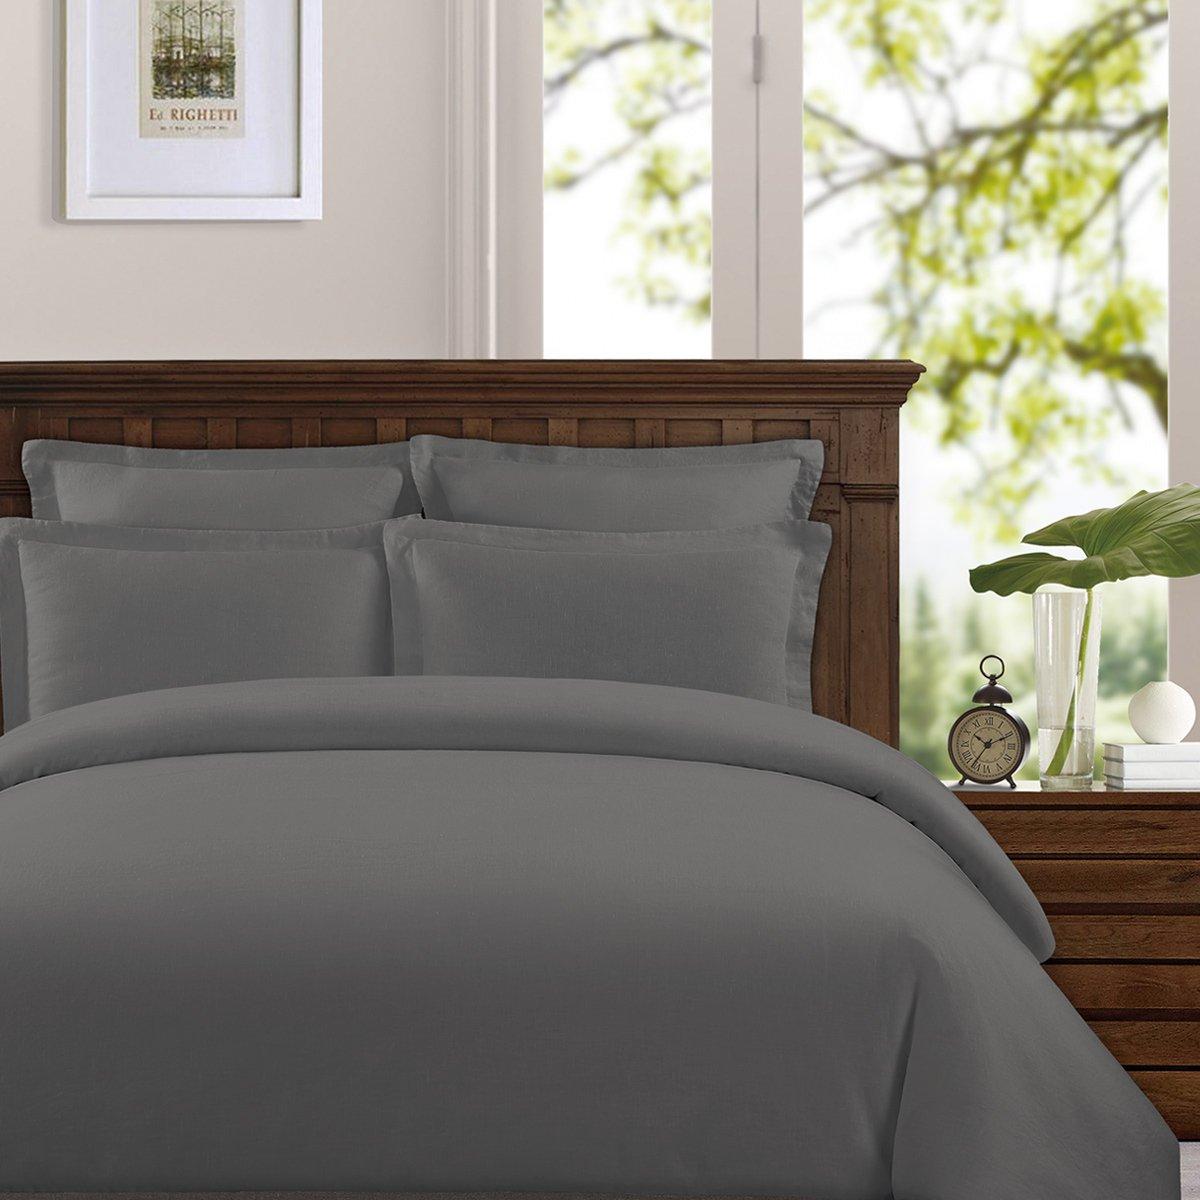 Echelon Home Washed Belgian Linen Duvet Cover Set, King, Slate Grey